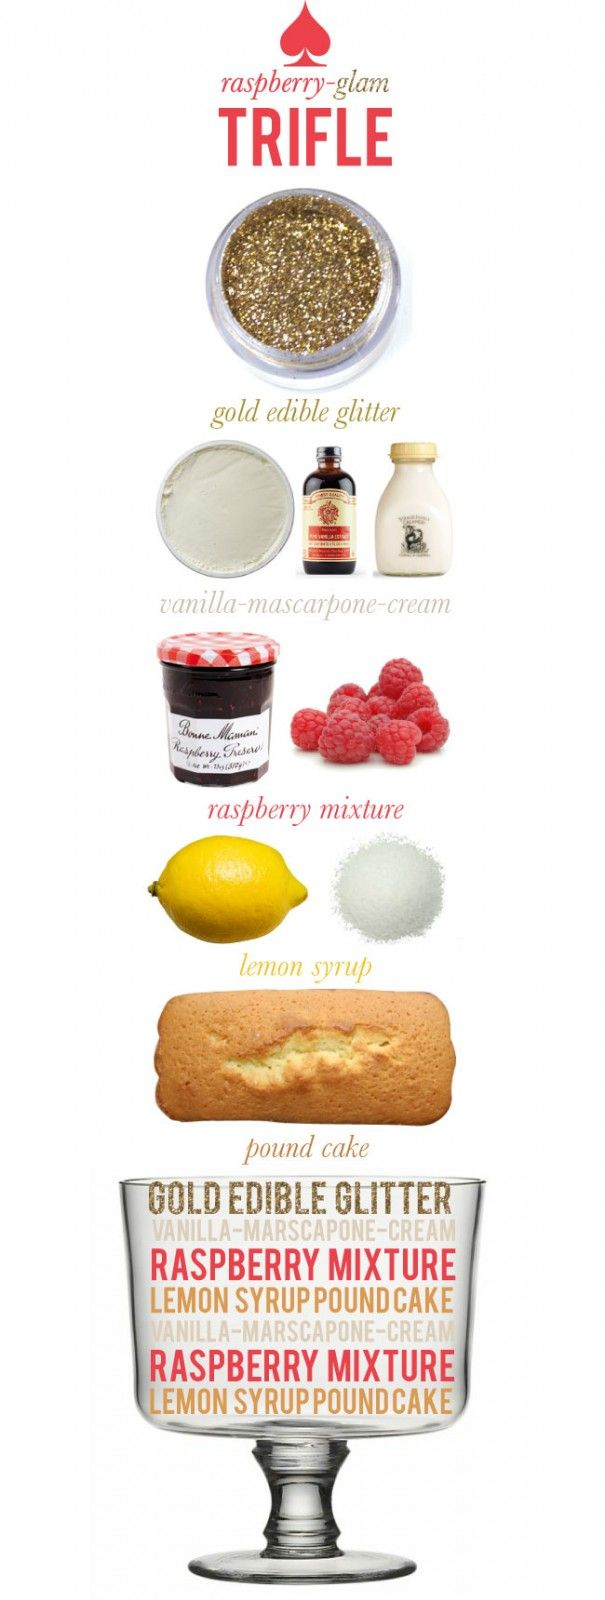 to make: Pound Cakes, Edible Glitter, Food, Raspberries Trifles, Recipes, Decade Desserts, Raspberries Glam Trifles, Lemon Trifle, Raspberry Glam Trifles